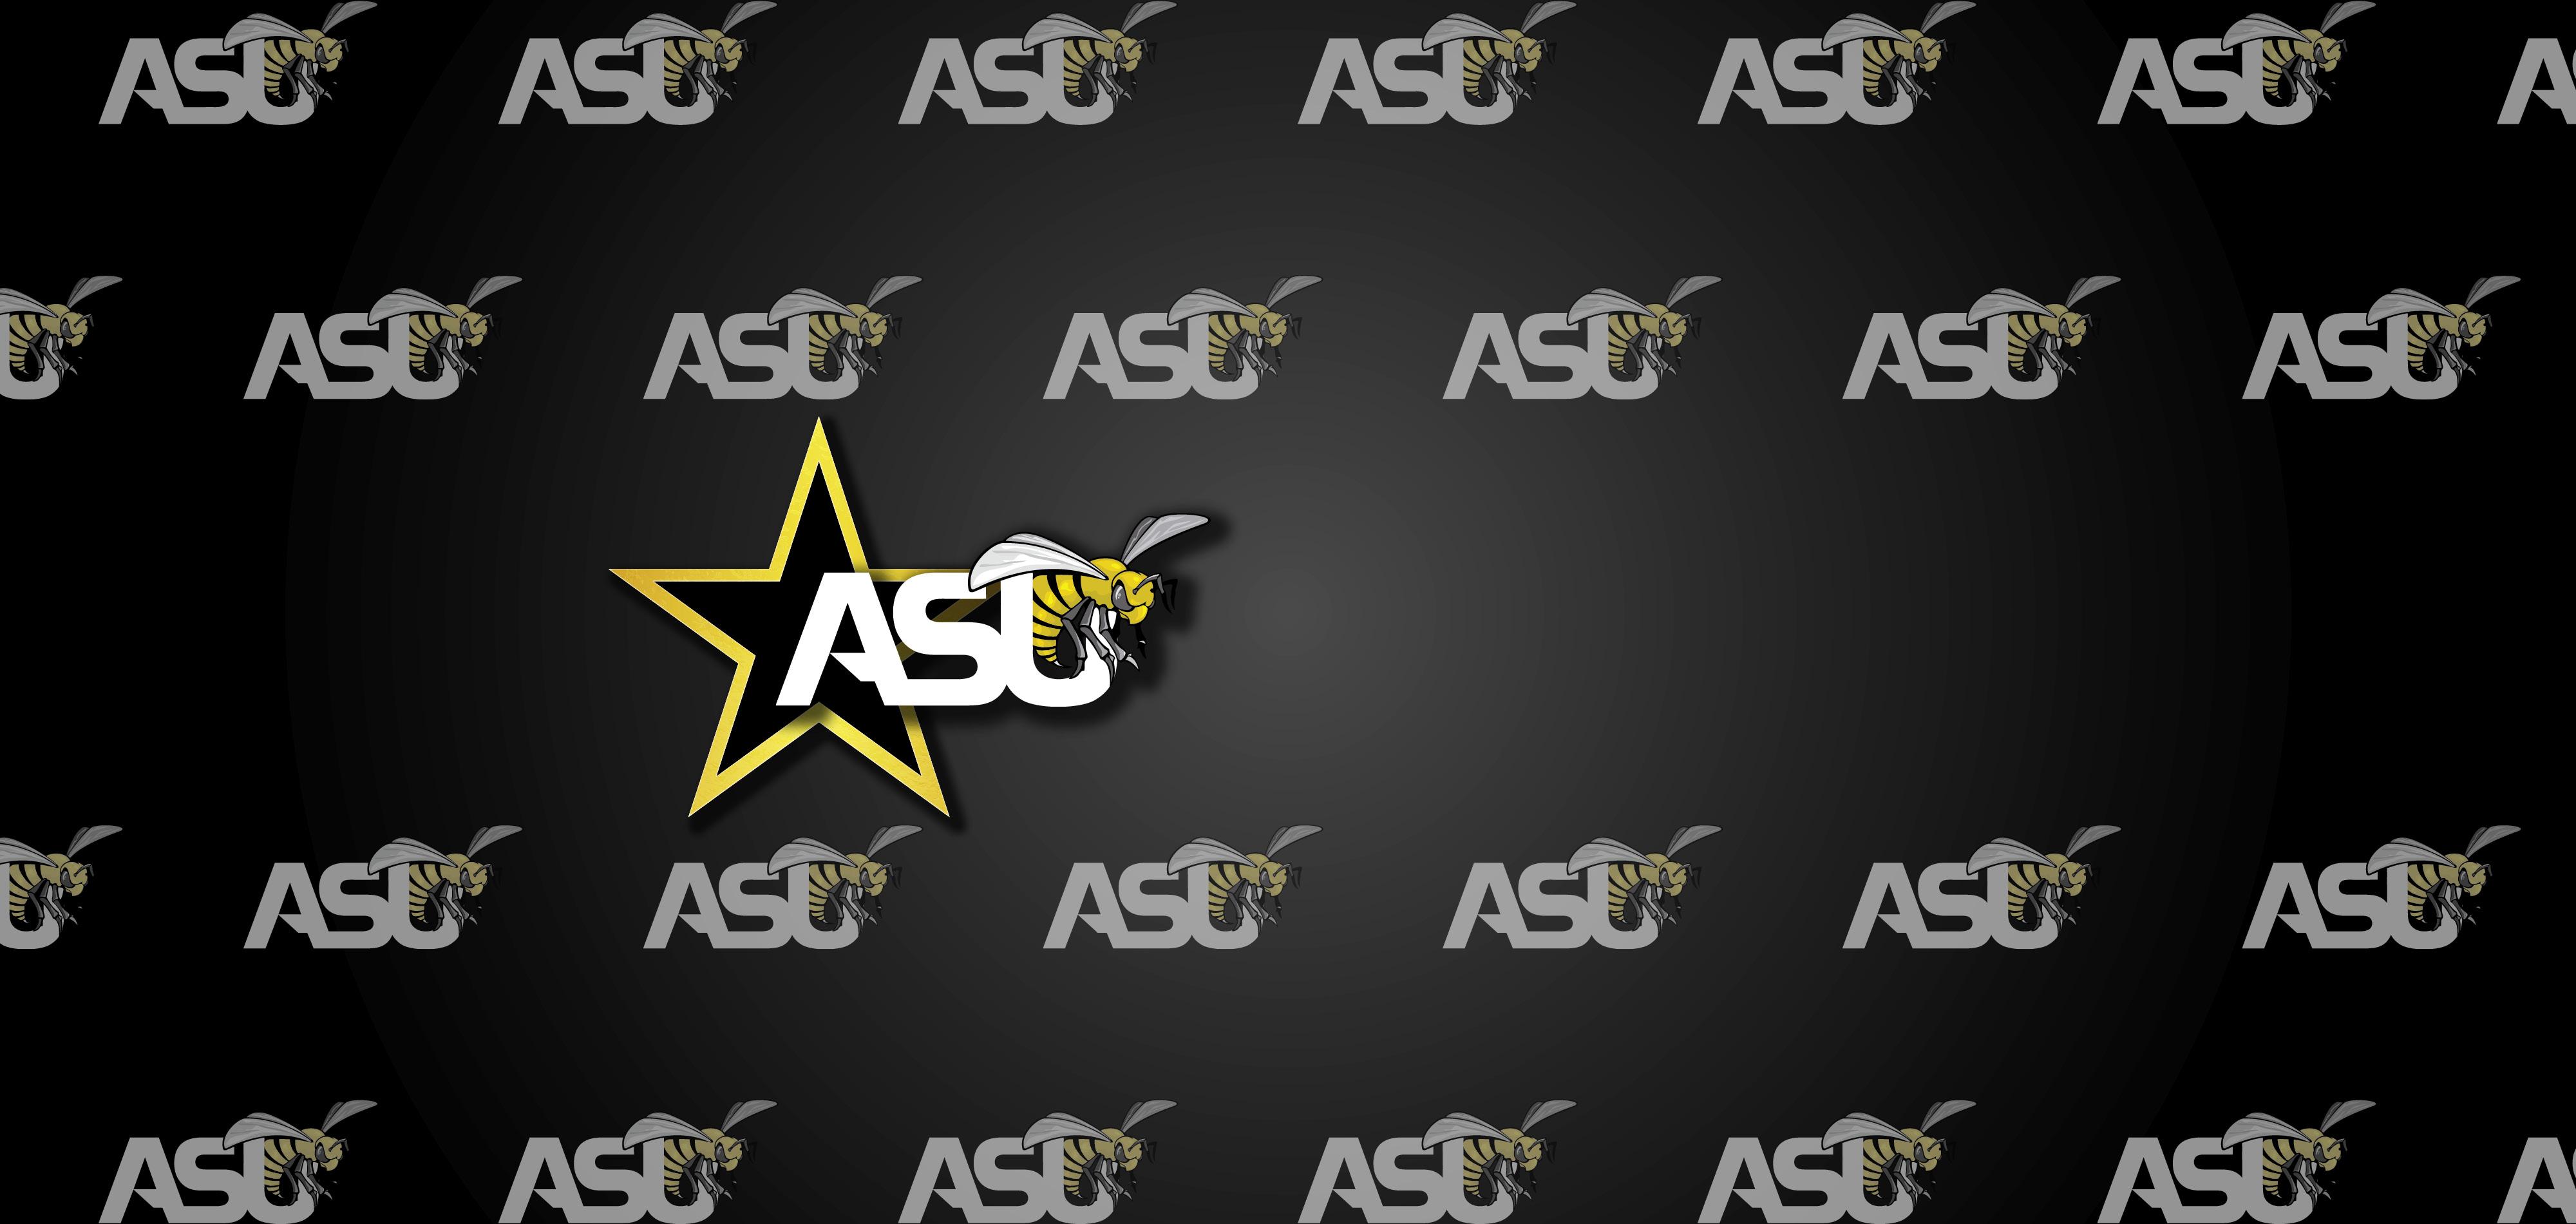 https://www.alasu.edu/sites/default/files/revslider/image/athletics_star_homepage.jpg